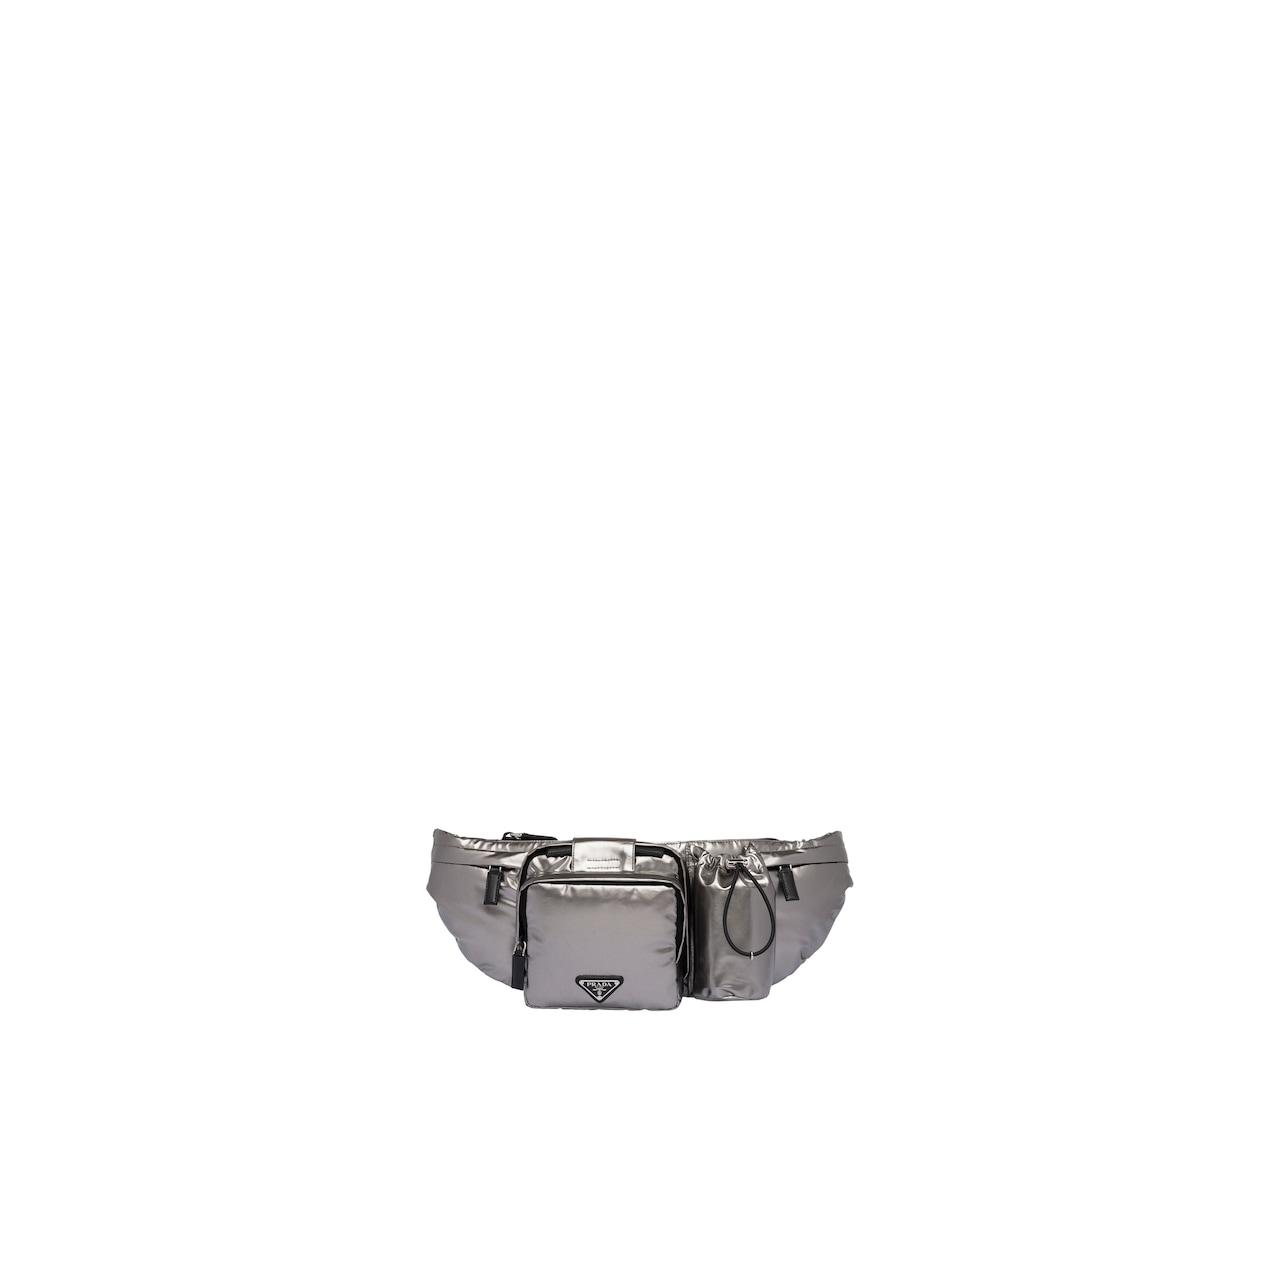 0ecaabdb8b23 Technical fabric belt bag | Prada - 2VL056_2B49_F0D65_V_WOO